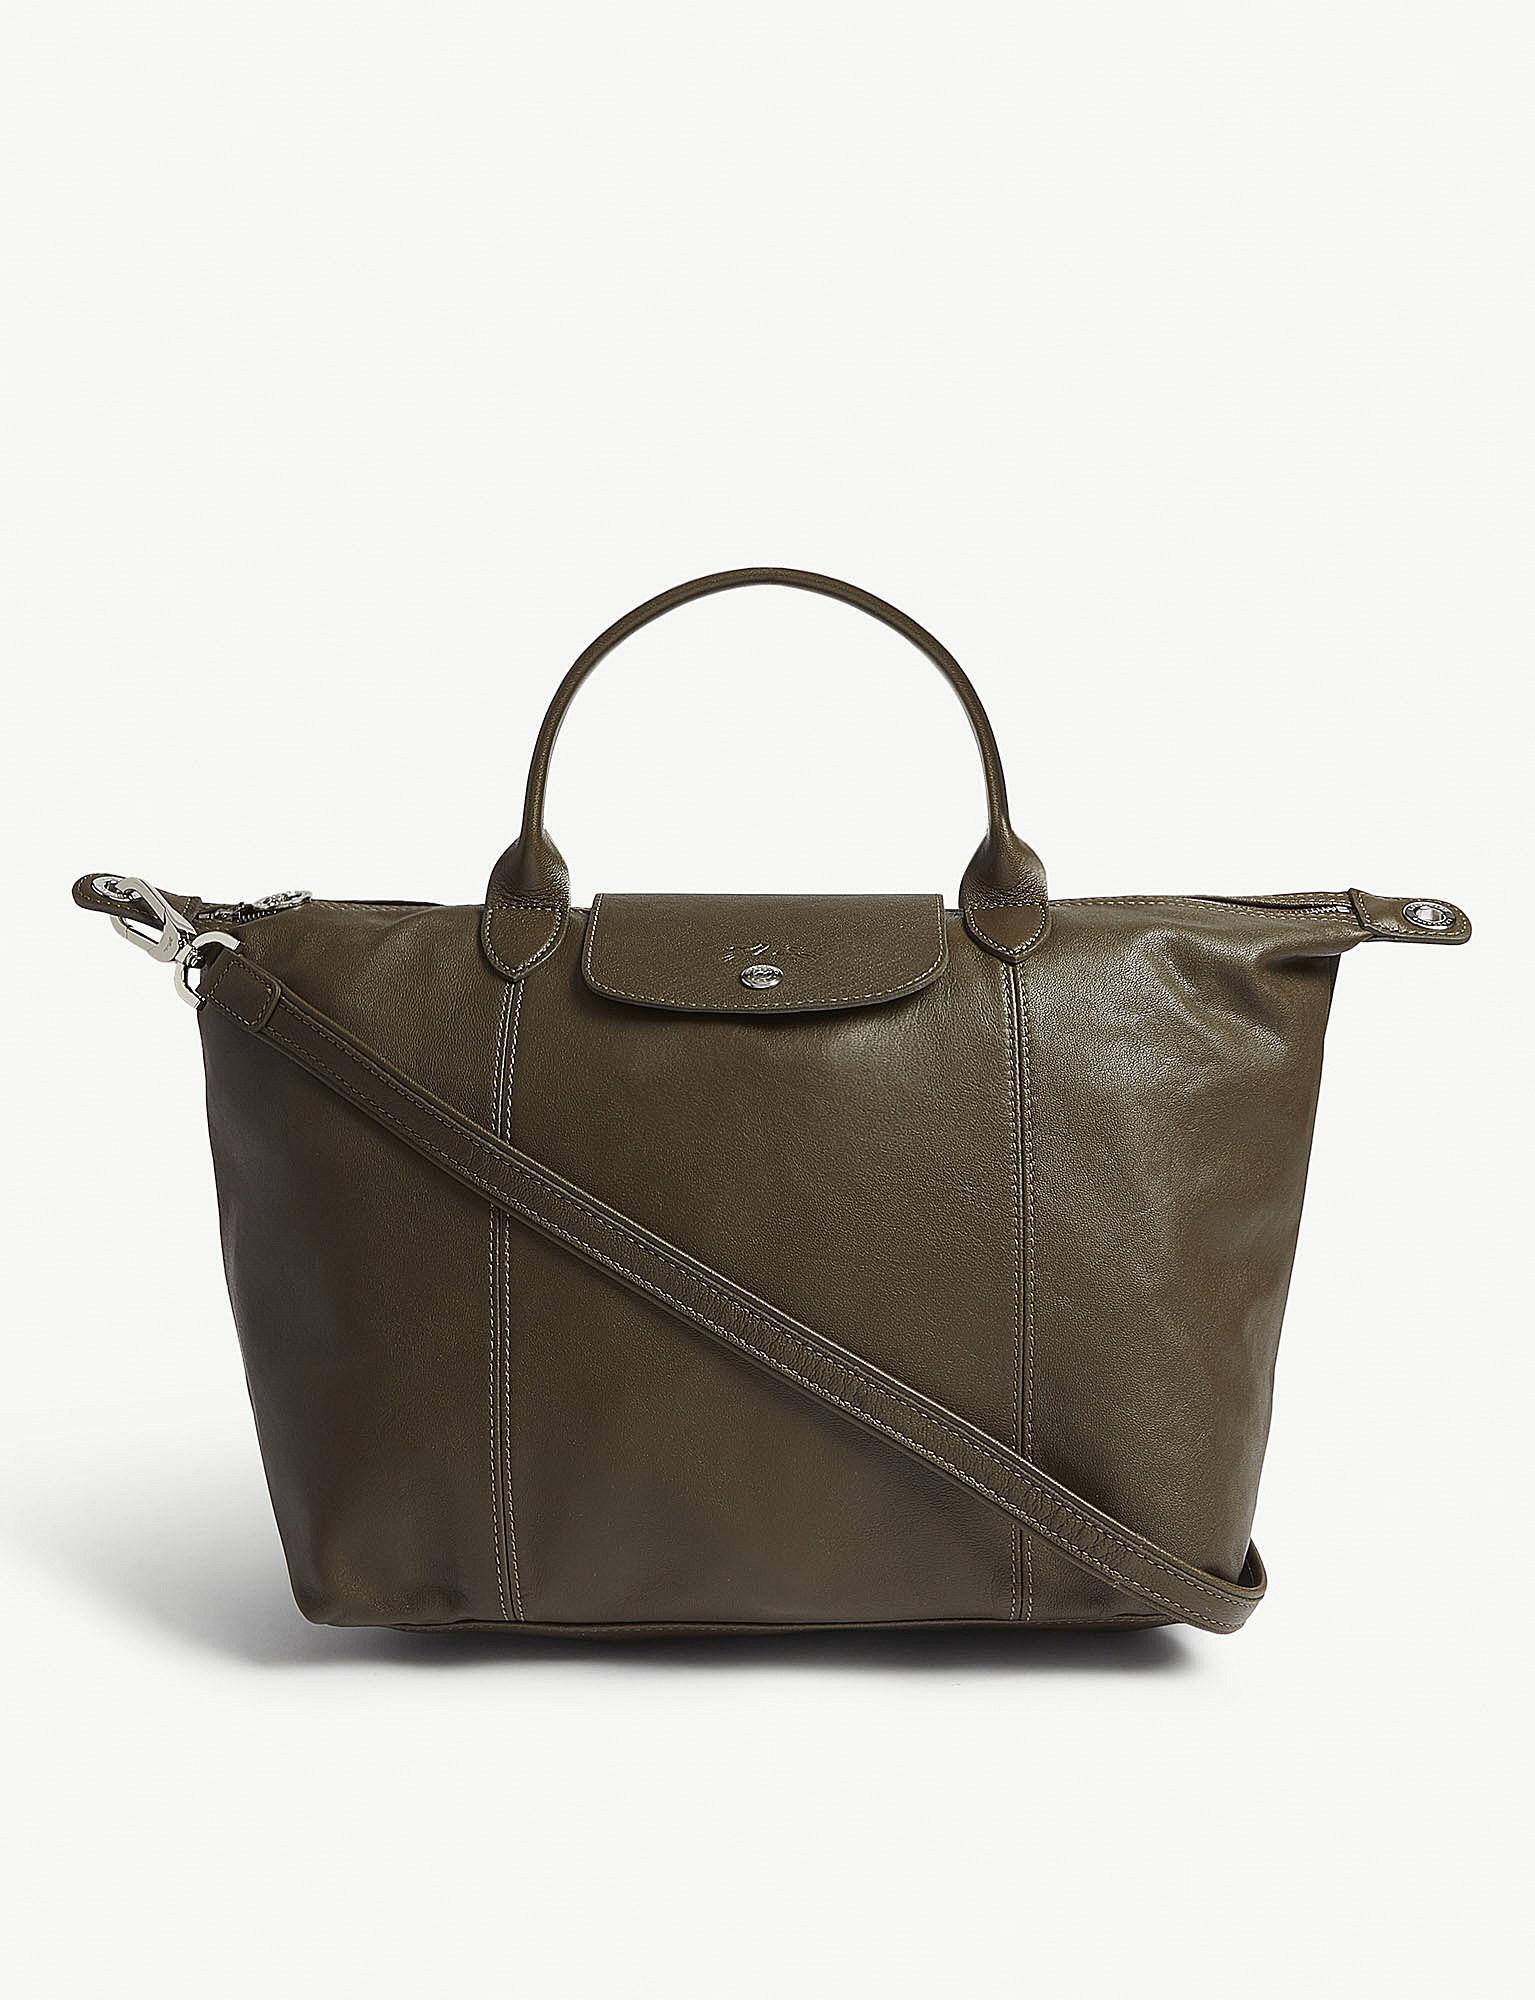 Longchamp Khaki Green Le Pliage Leather Shoulder Bag - Lyst 1abf6e8c51470